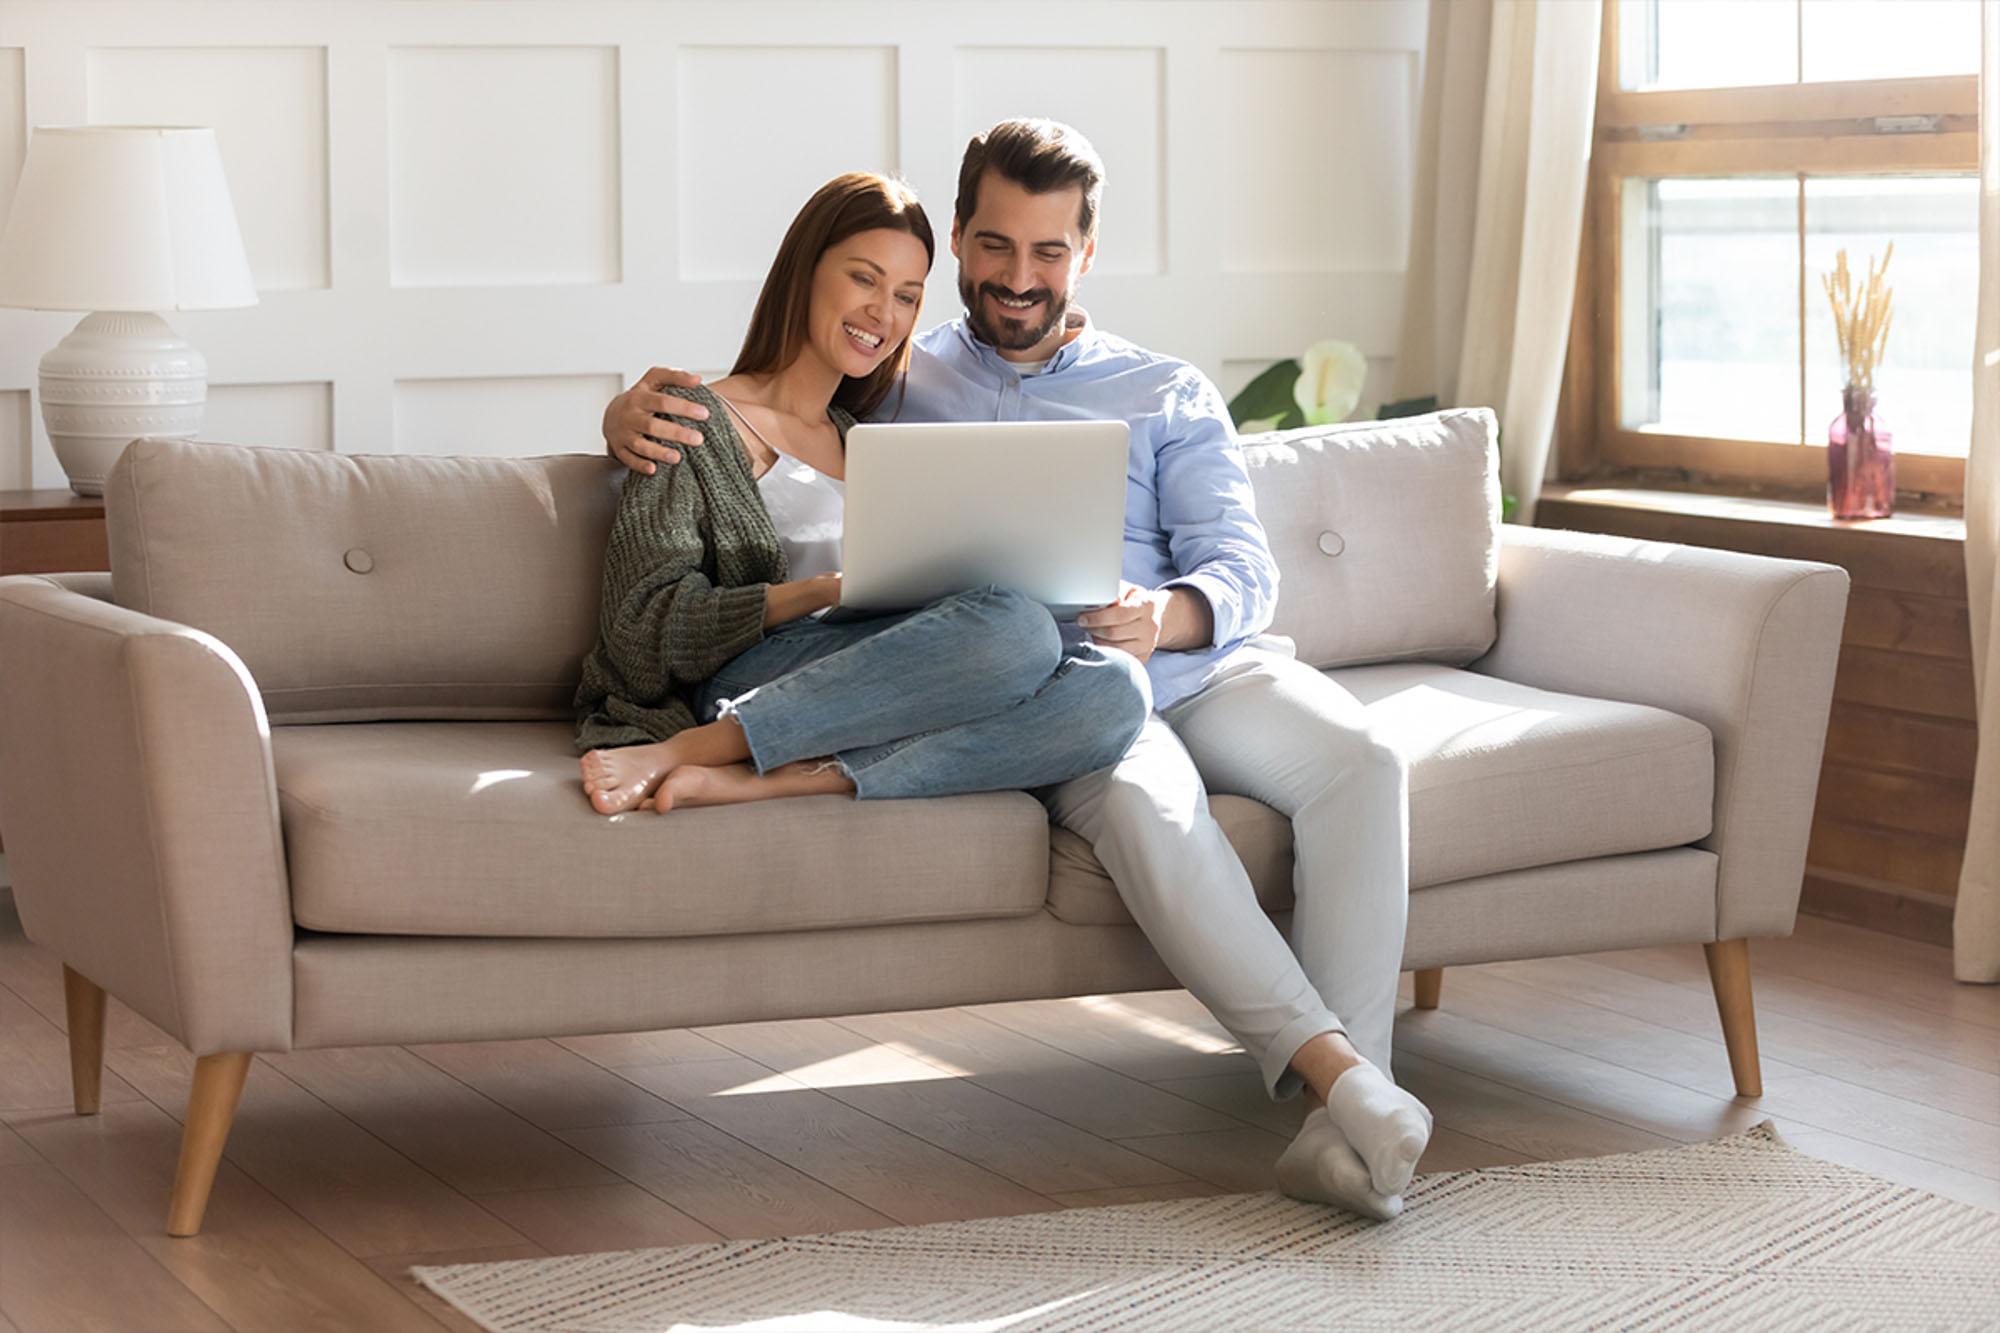 Profit windows and doors Coming Soon -Finance Options